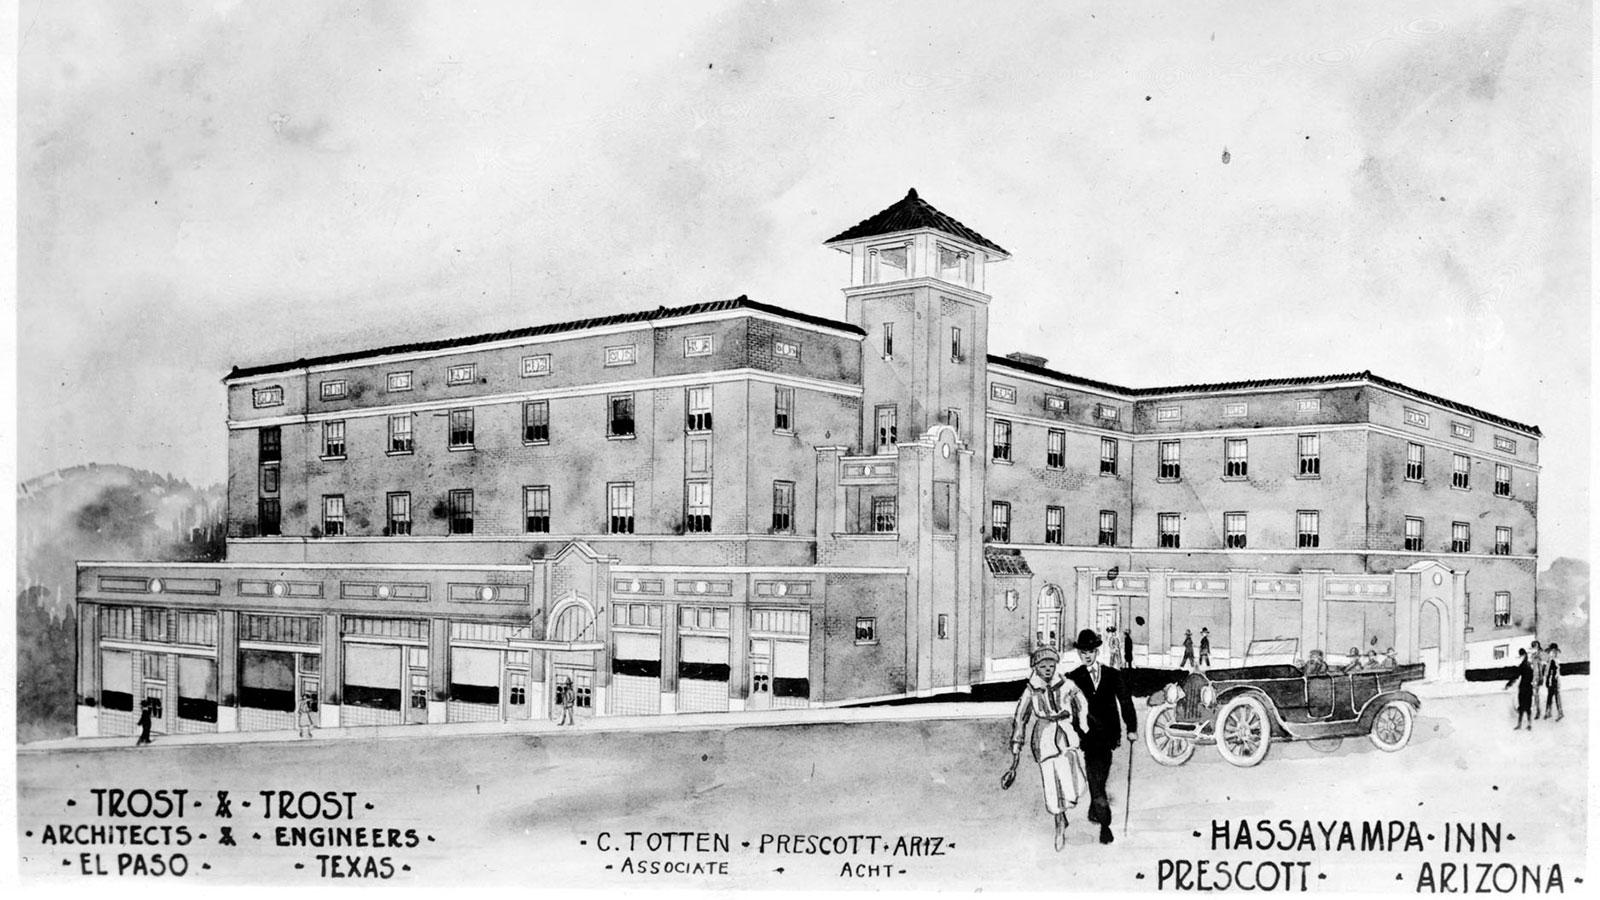 Historic image of hotel exterior at Hassayampa Inn, 1927, Member of Historic Hotels of America, in Prescott, Arizona, Discover